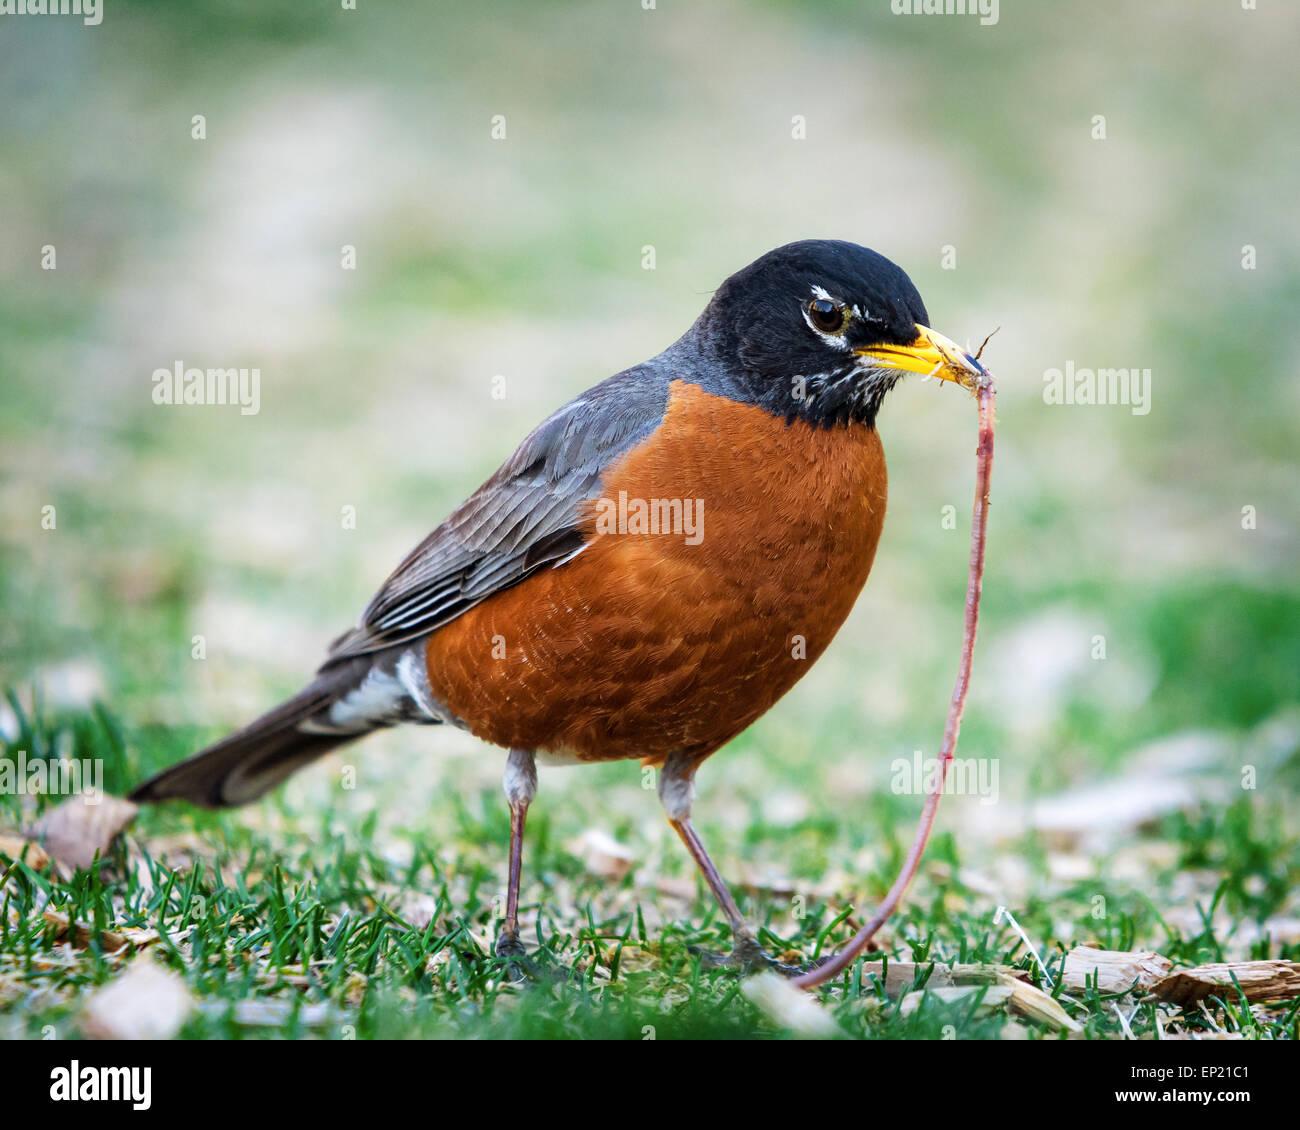 Robin mit einem Wurm im Maul Stockbild